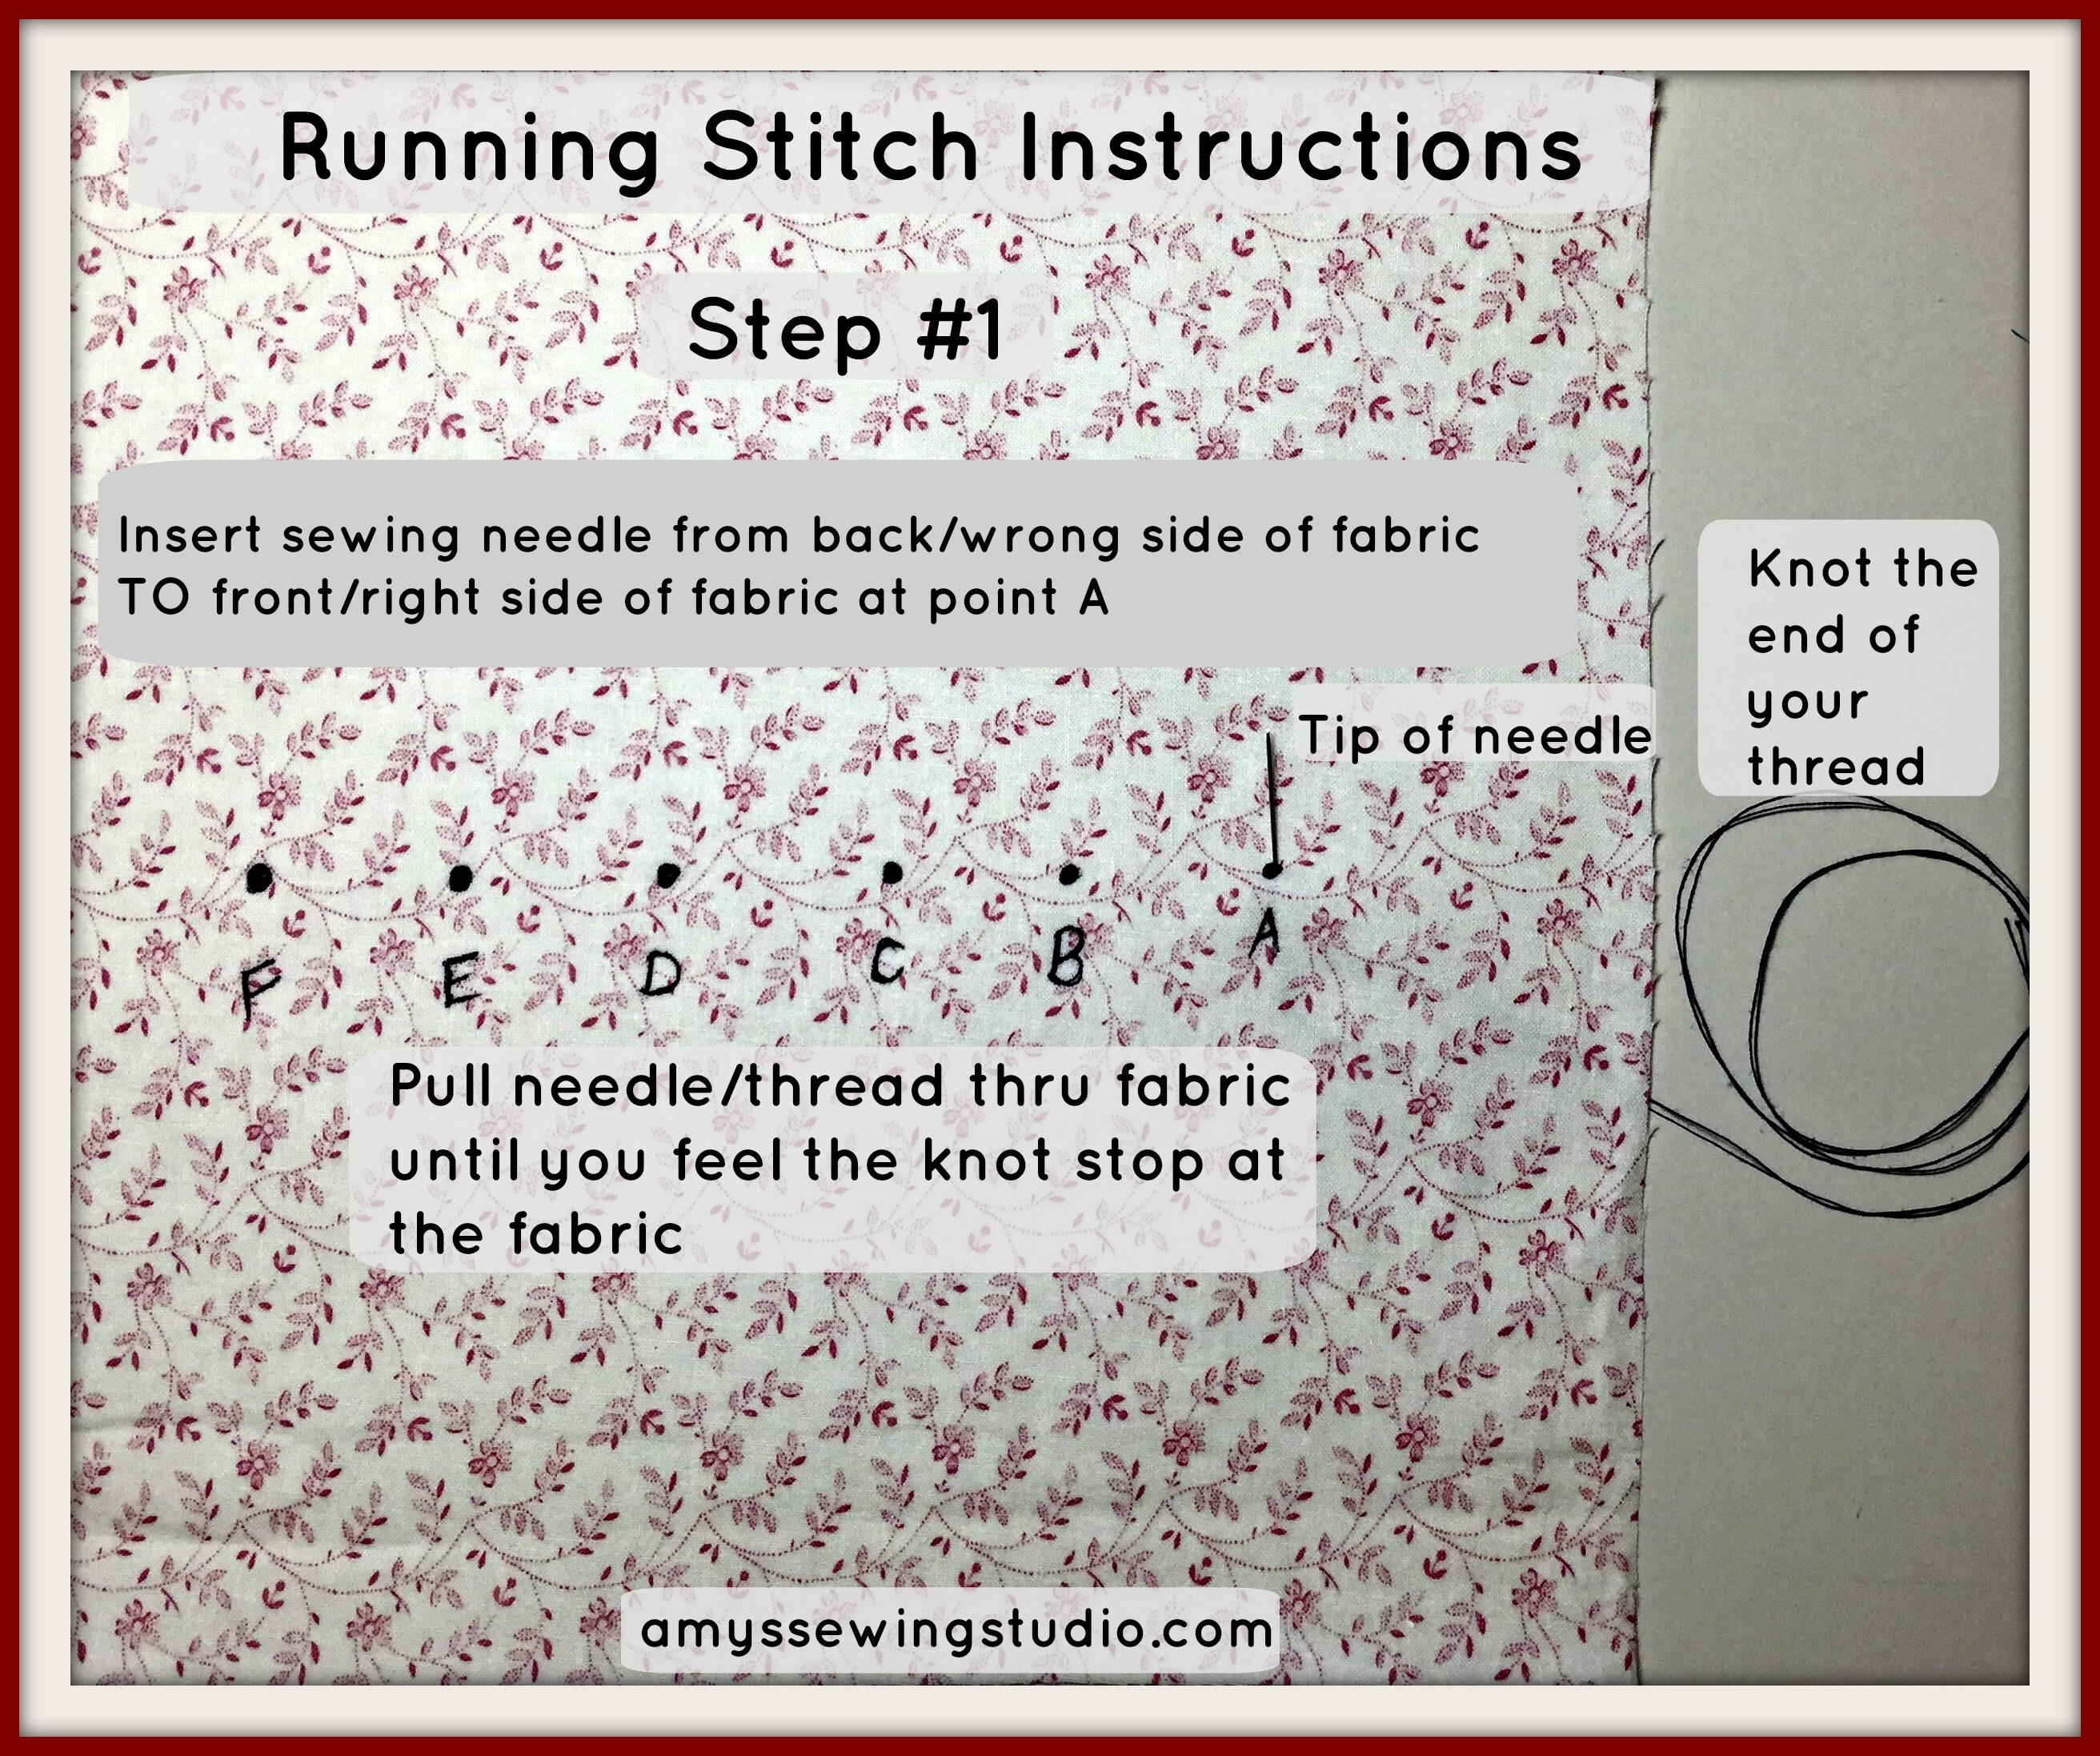 Running Stitch Instructions 1